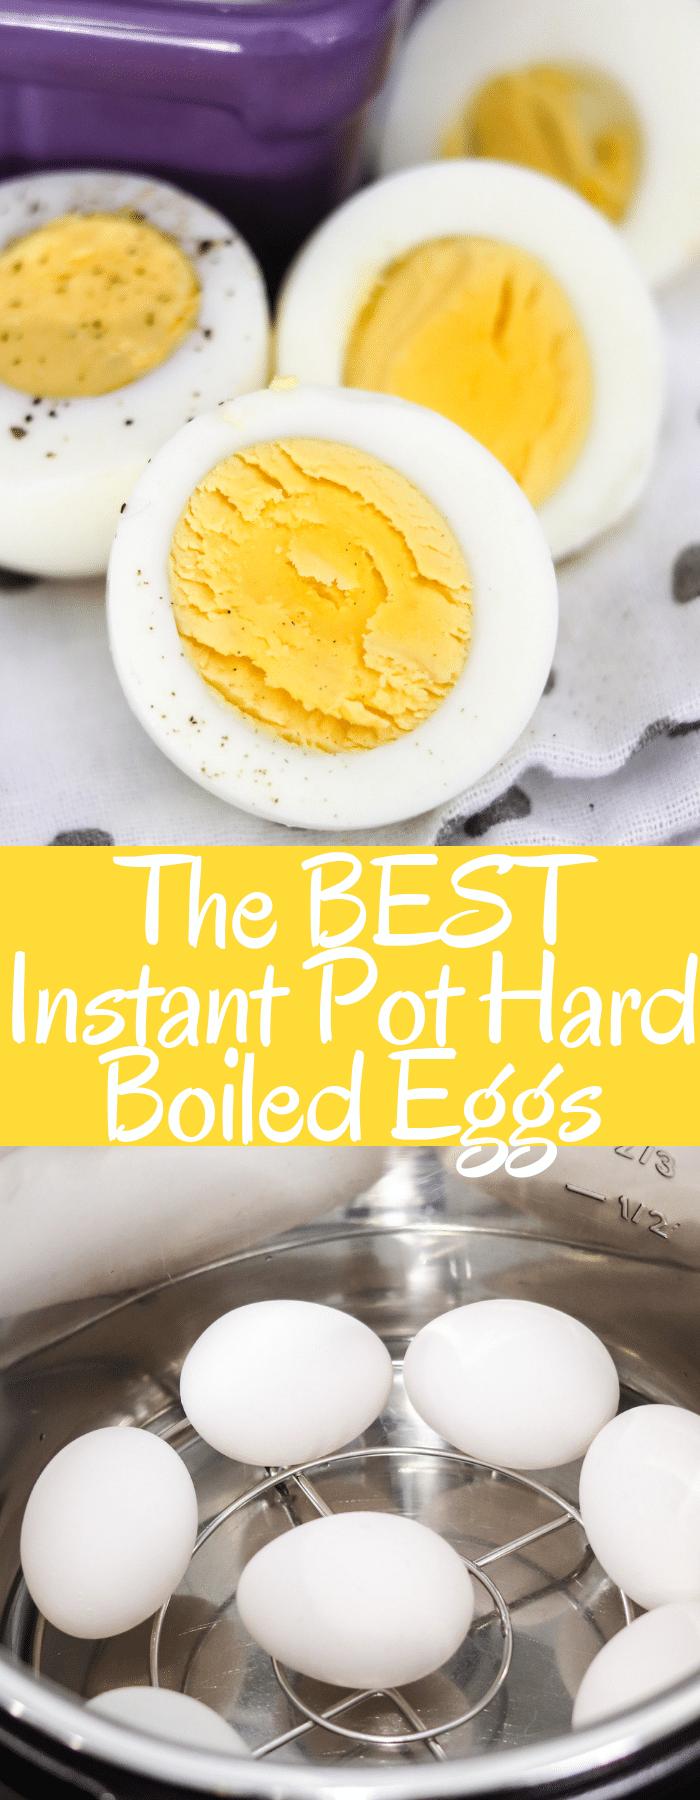 The BEST Instant Pot Hard Boiled Eggs